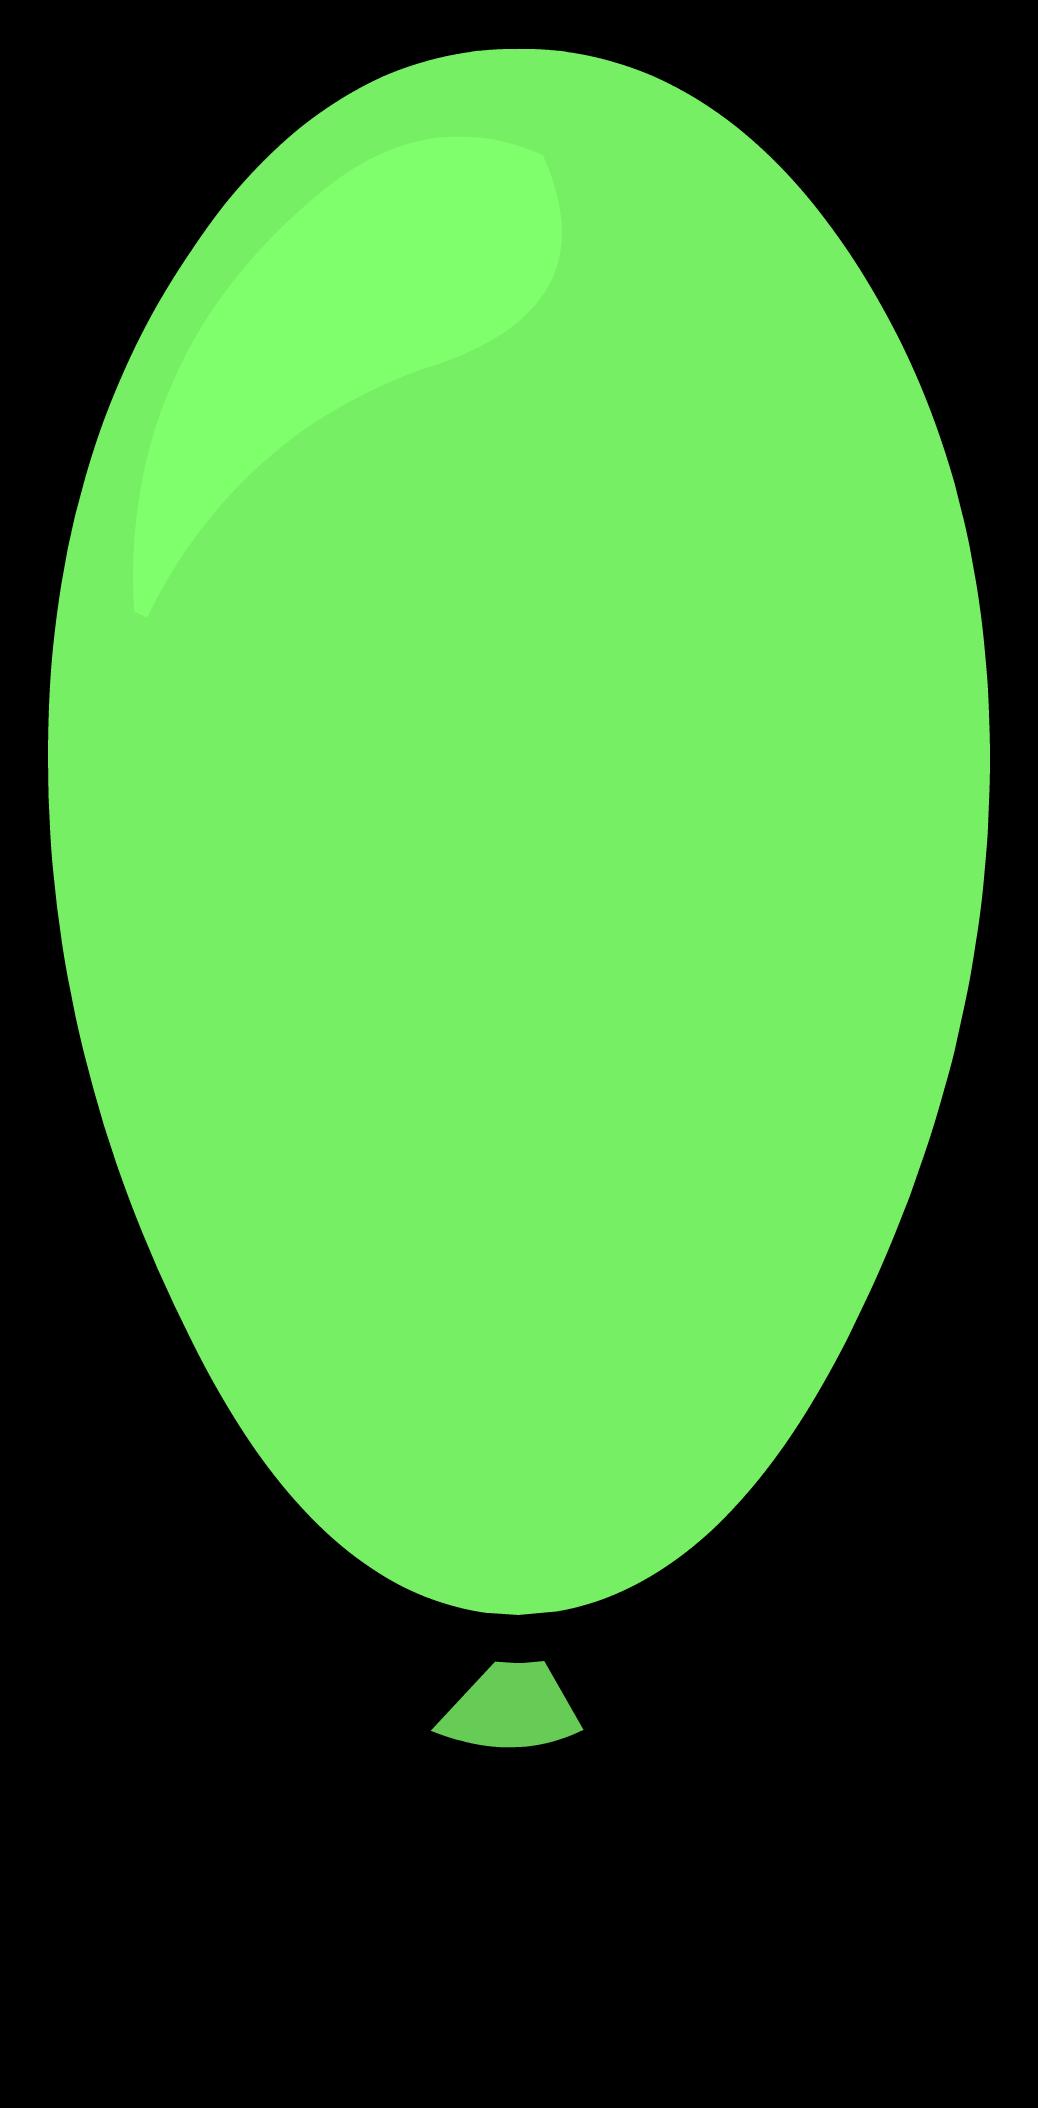 Green Balloon (furniture)